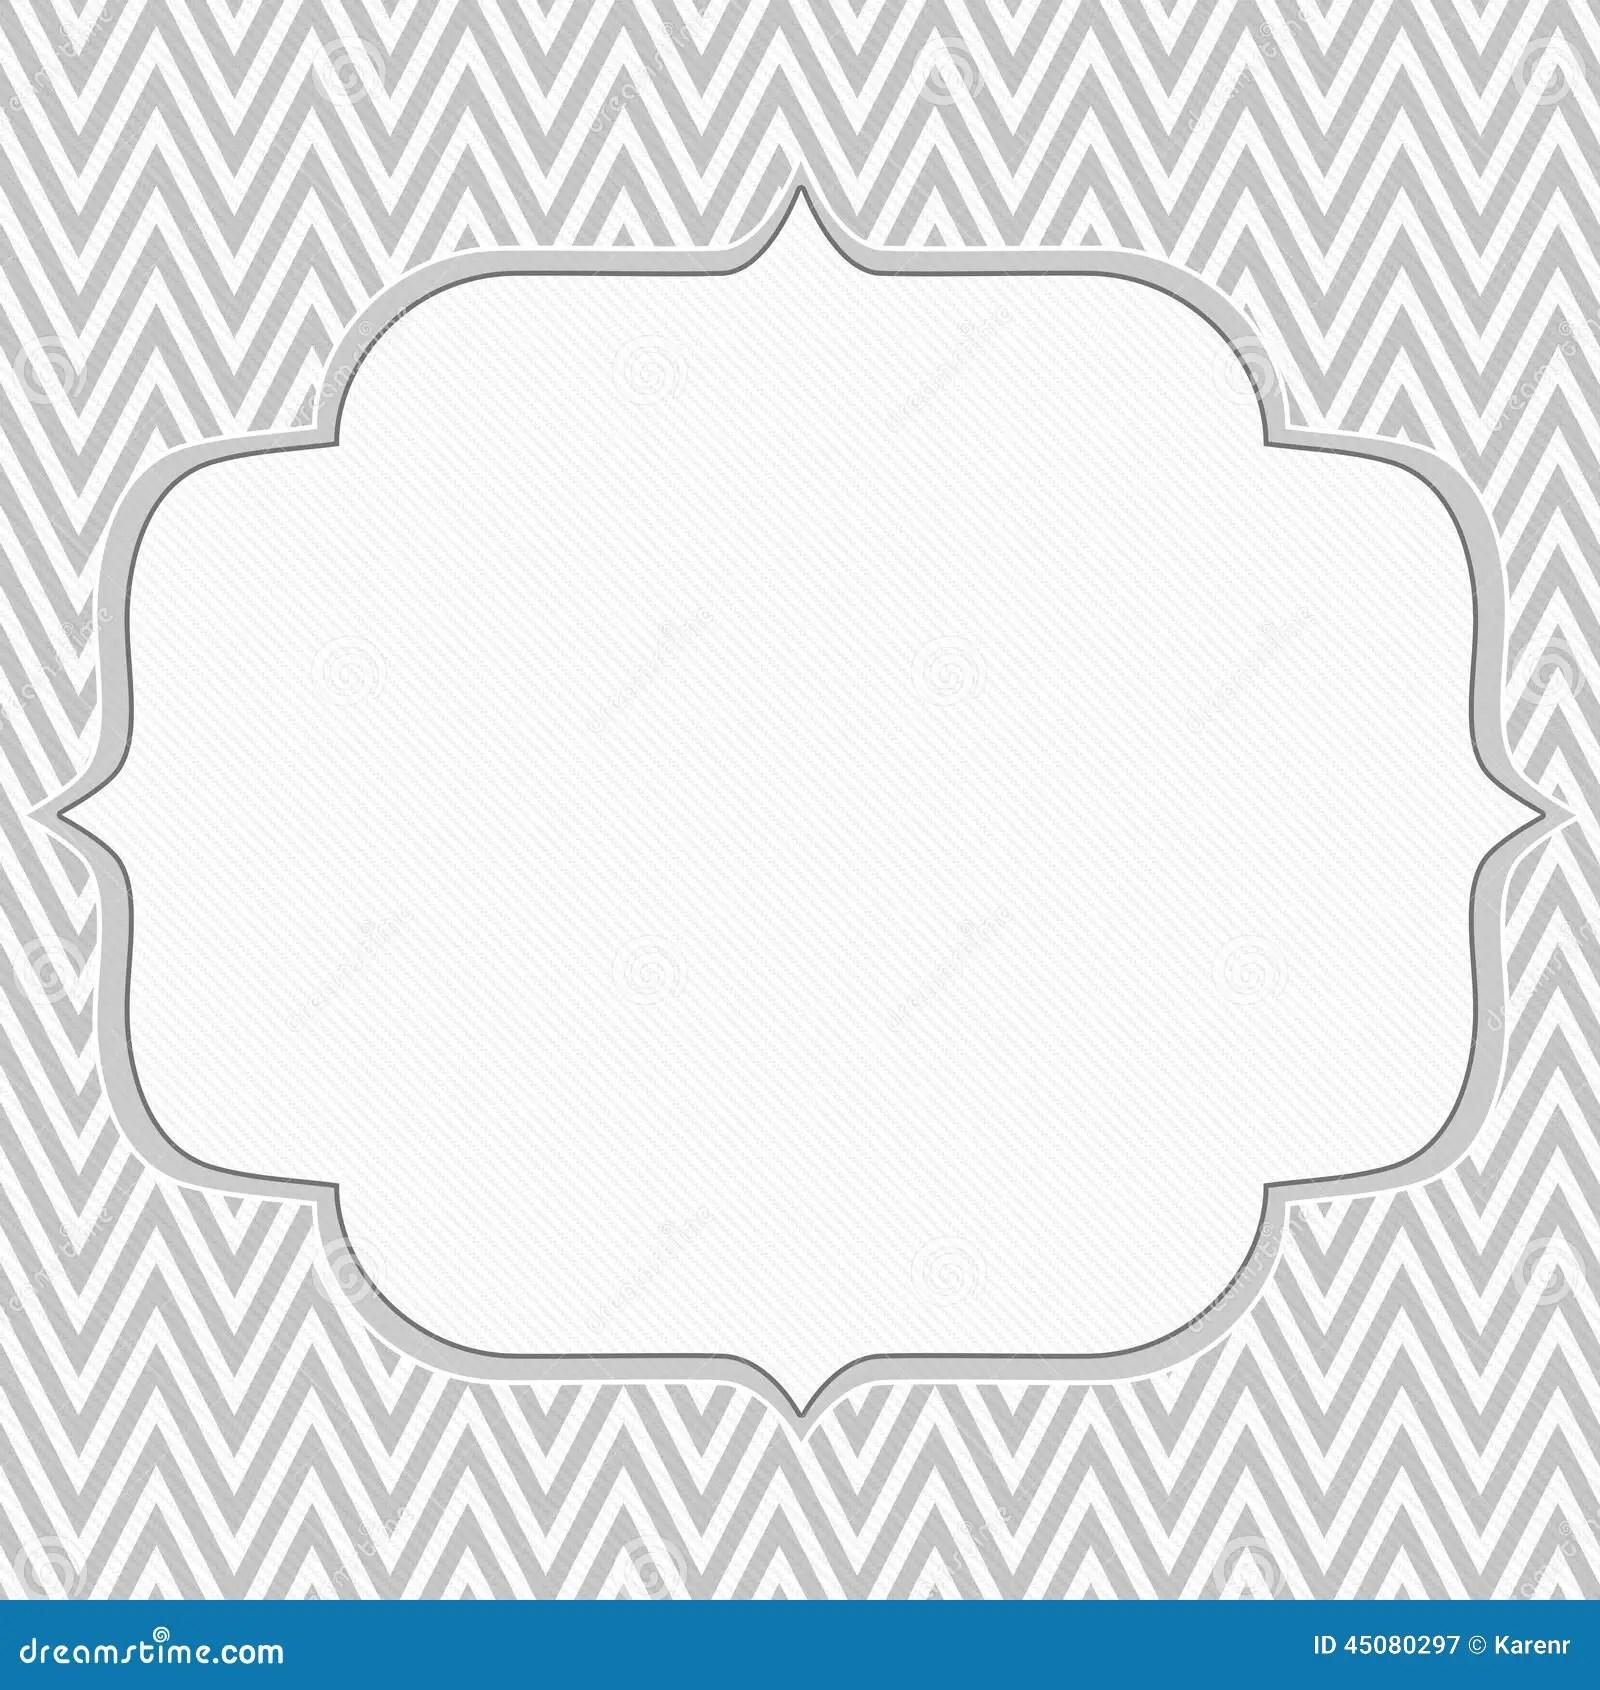 Gray And White Chevron Zigzag Frame Background Stock Illustration